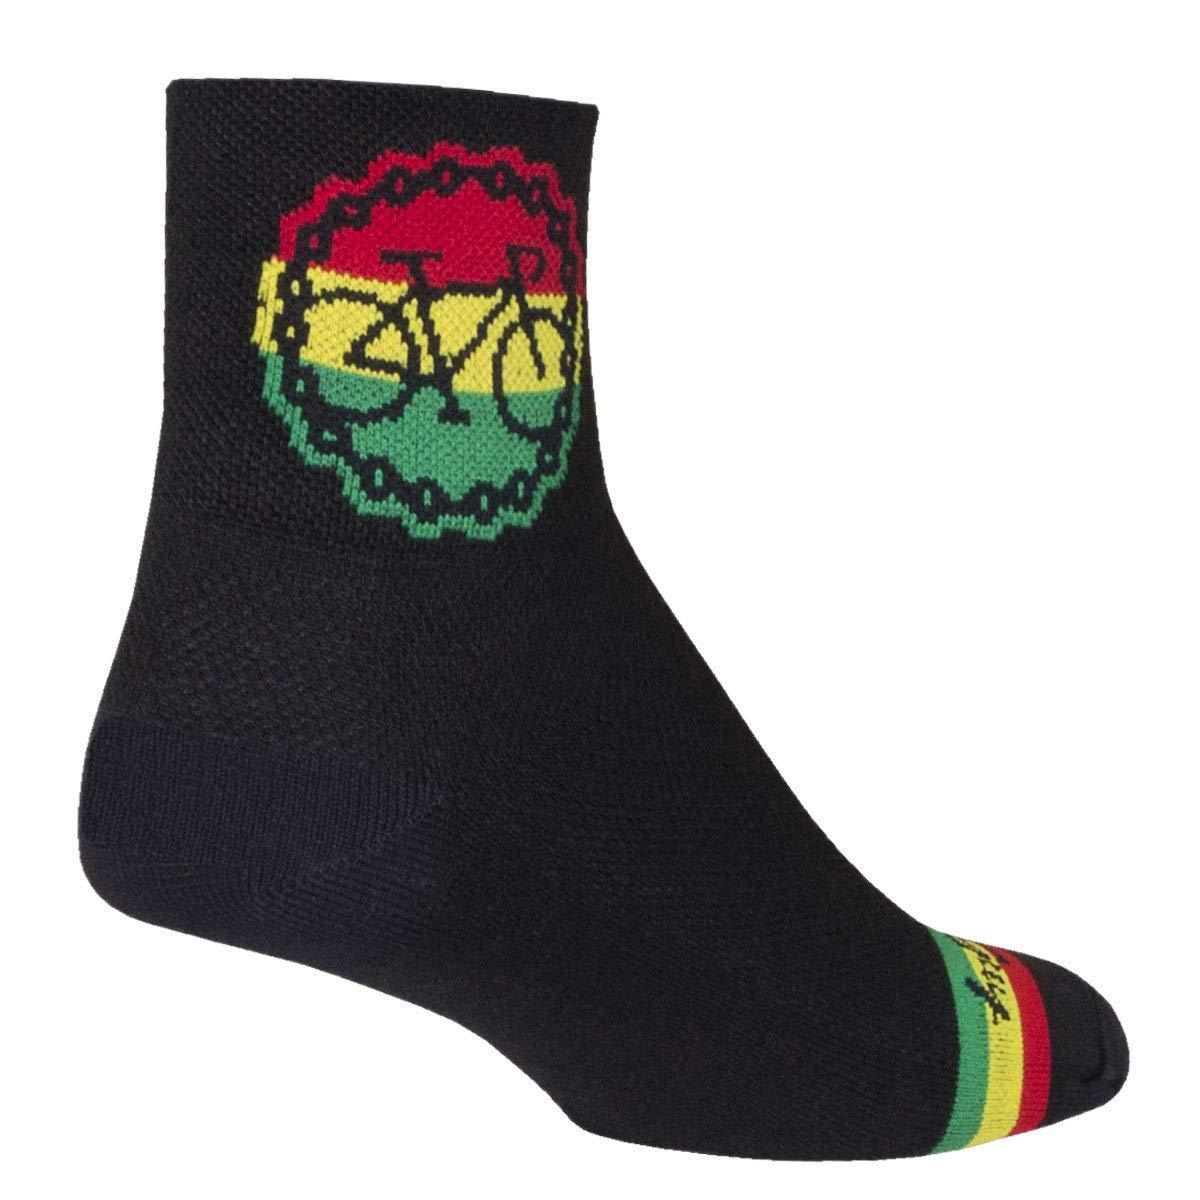 classic cycling socks